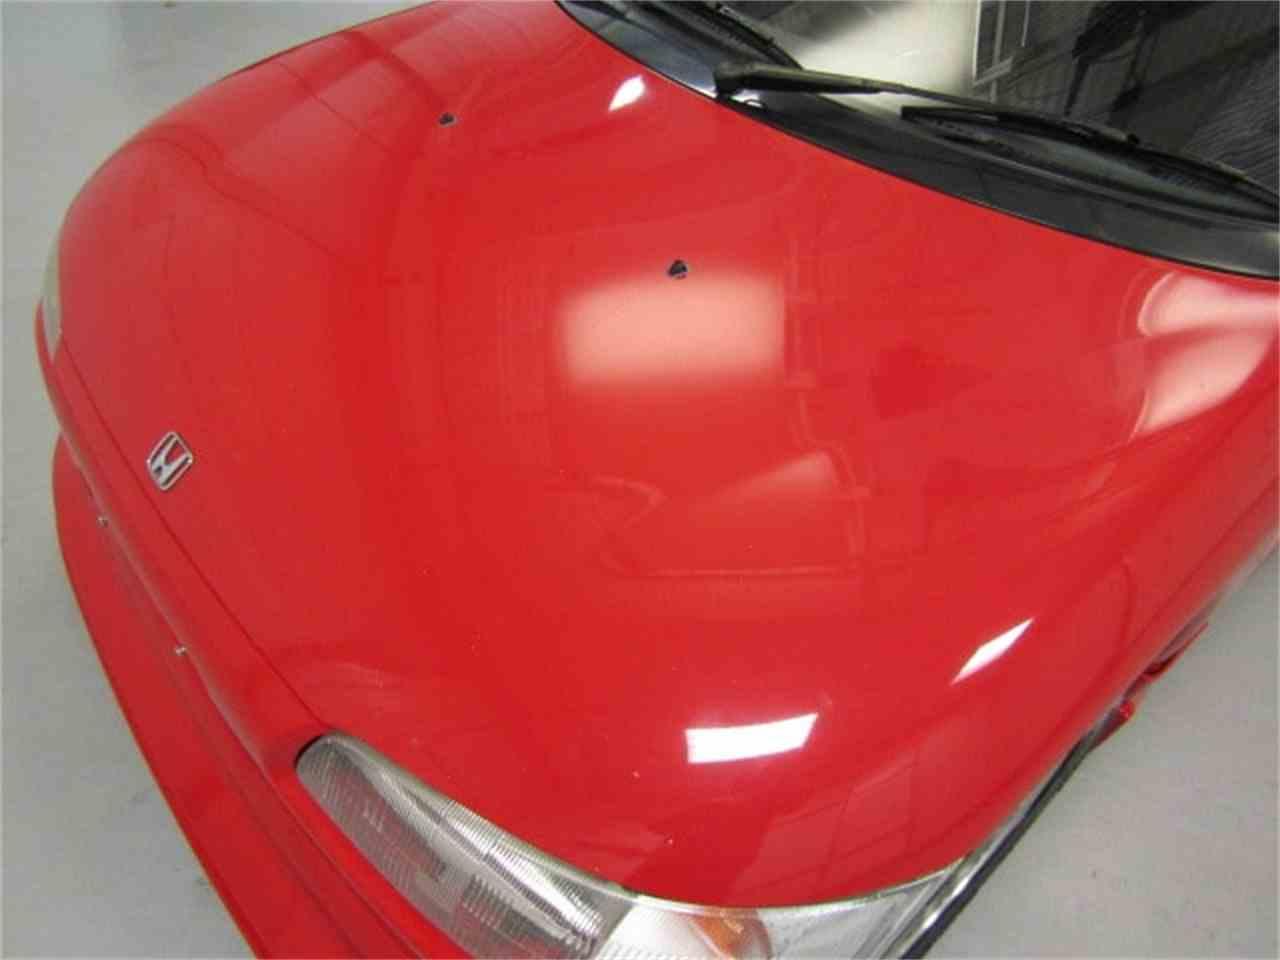 Large Picture of 1991 Honda Beat located in Virginia - $6,999.00 - JL83